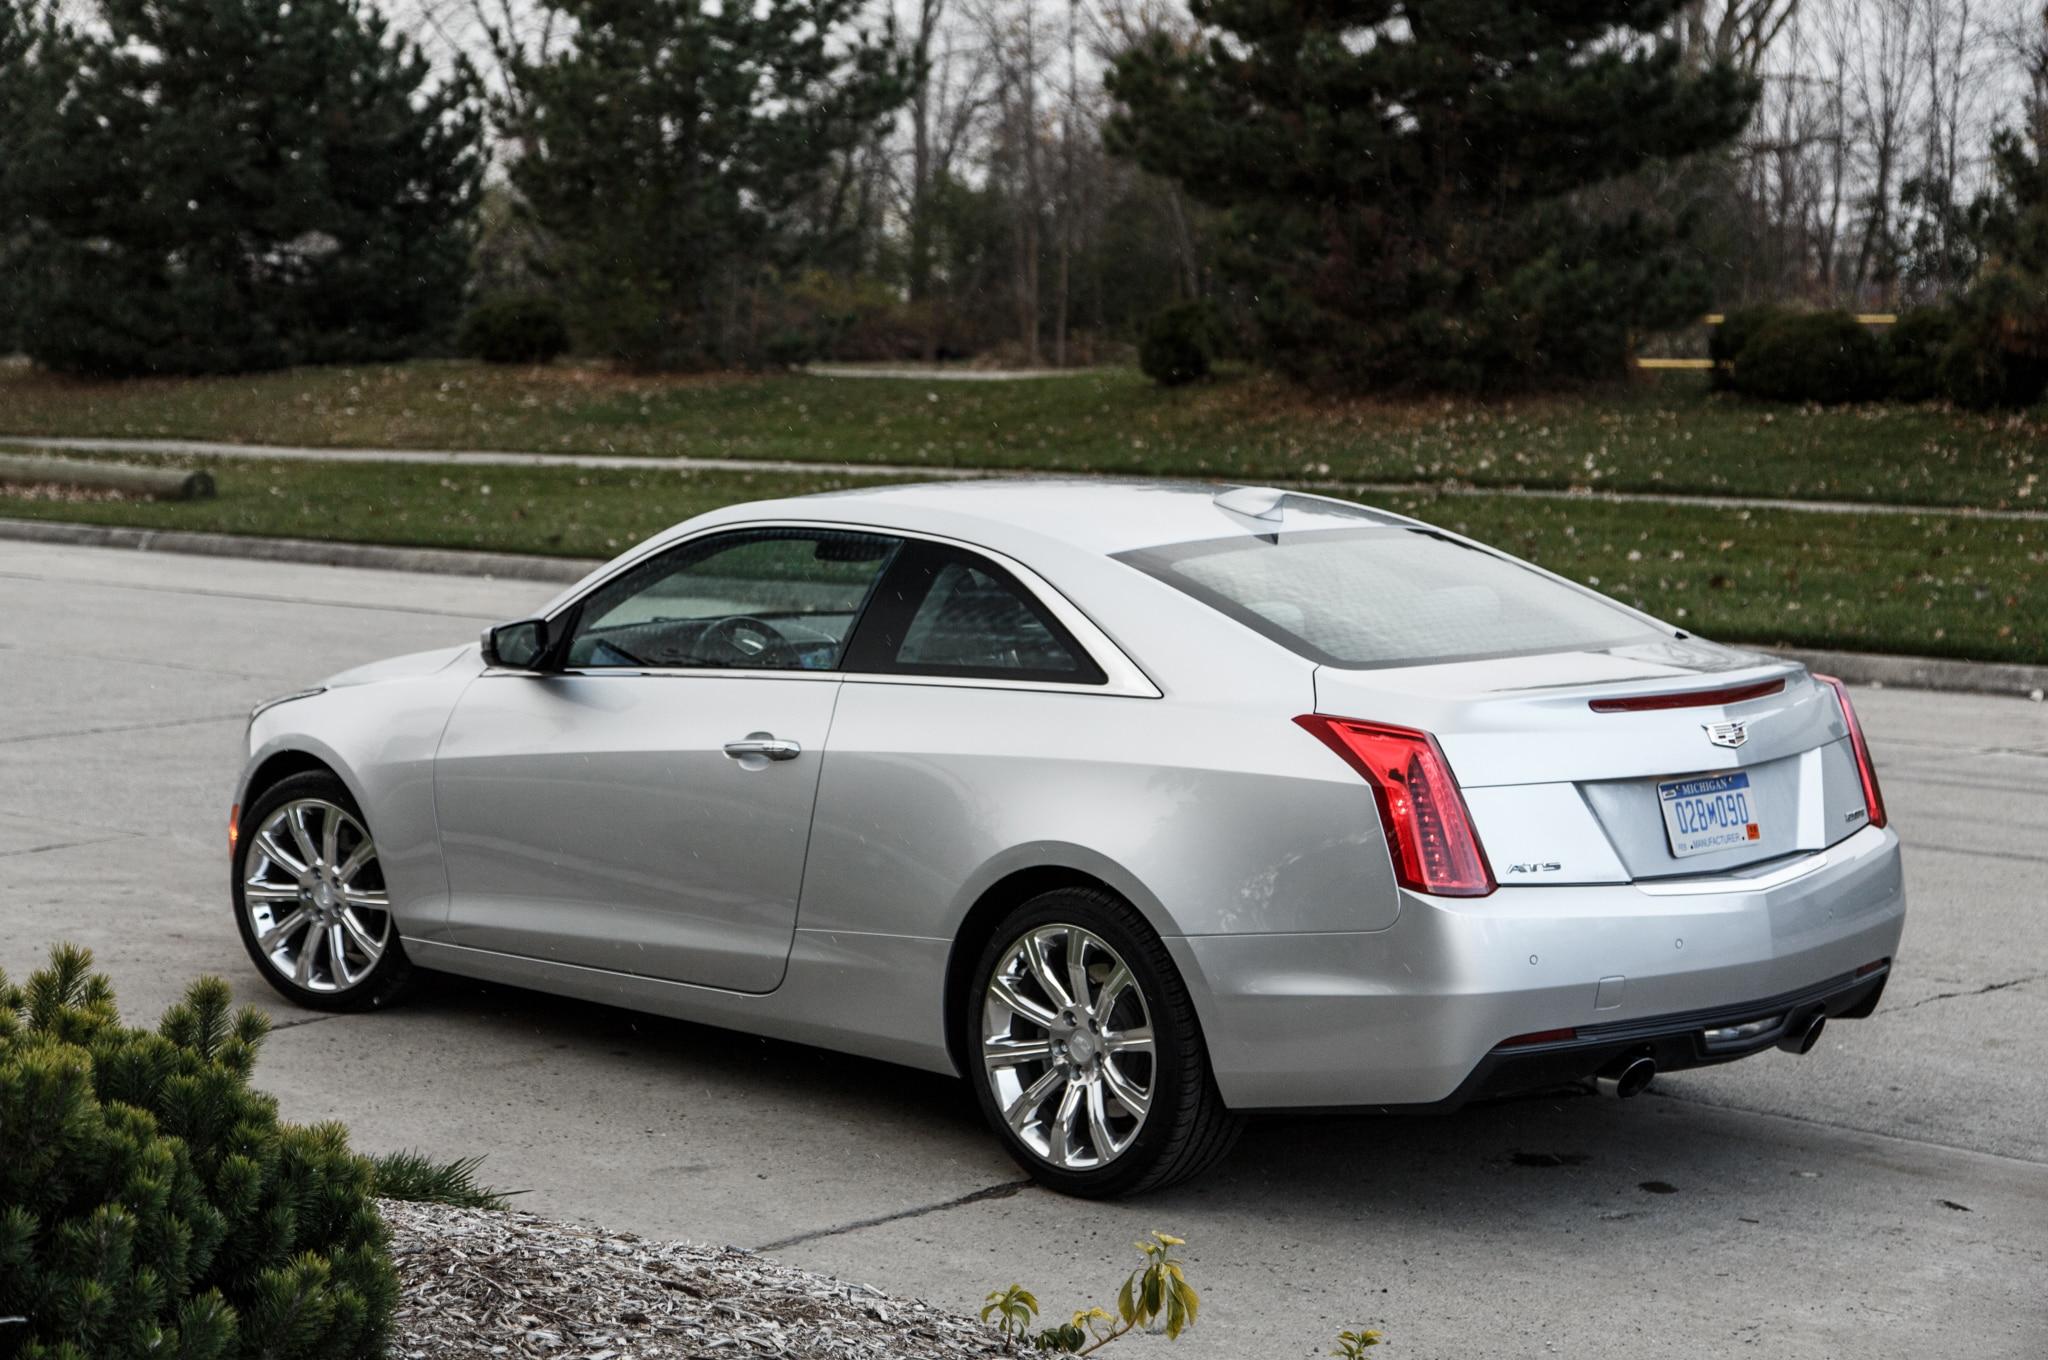 2015 Cadillac ATS Coupe 2.0T Manual: Around the Block